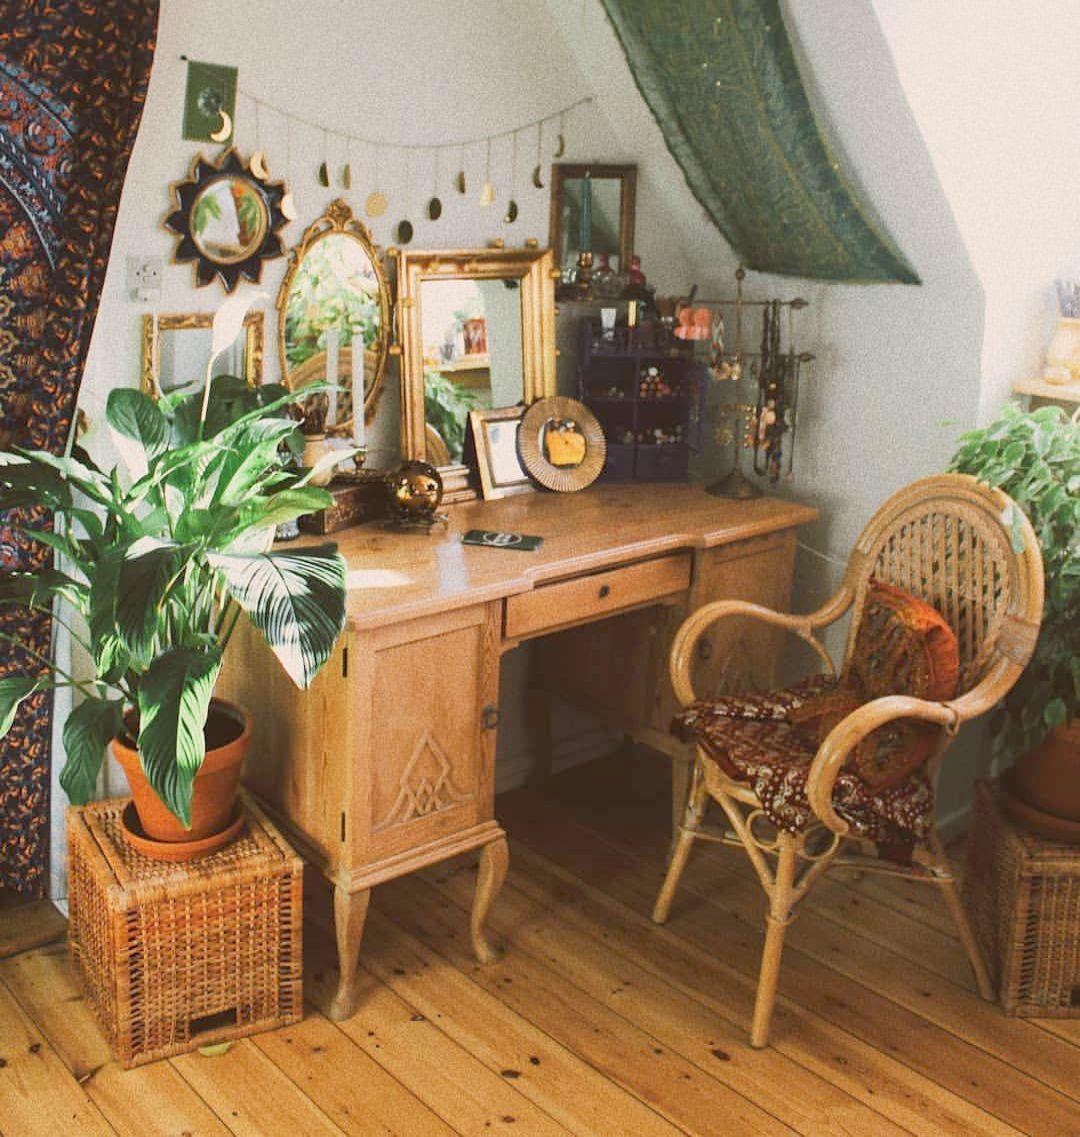 Travelex Korean Won Outside Acre Jewellery Exchange Home Decor Bedding Vintage Home Decor Retro Home Decor